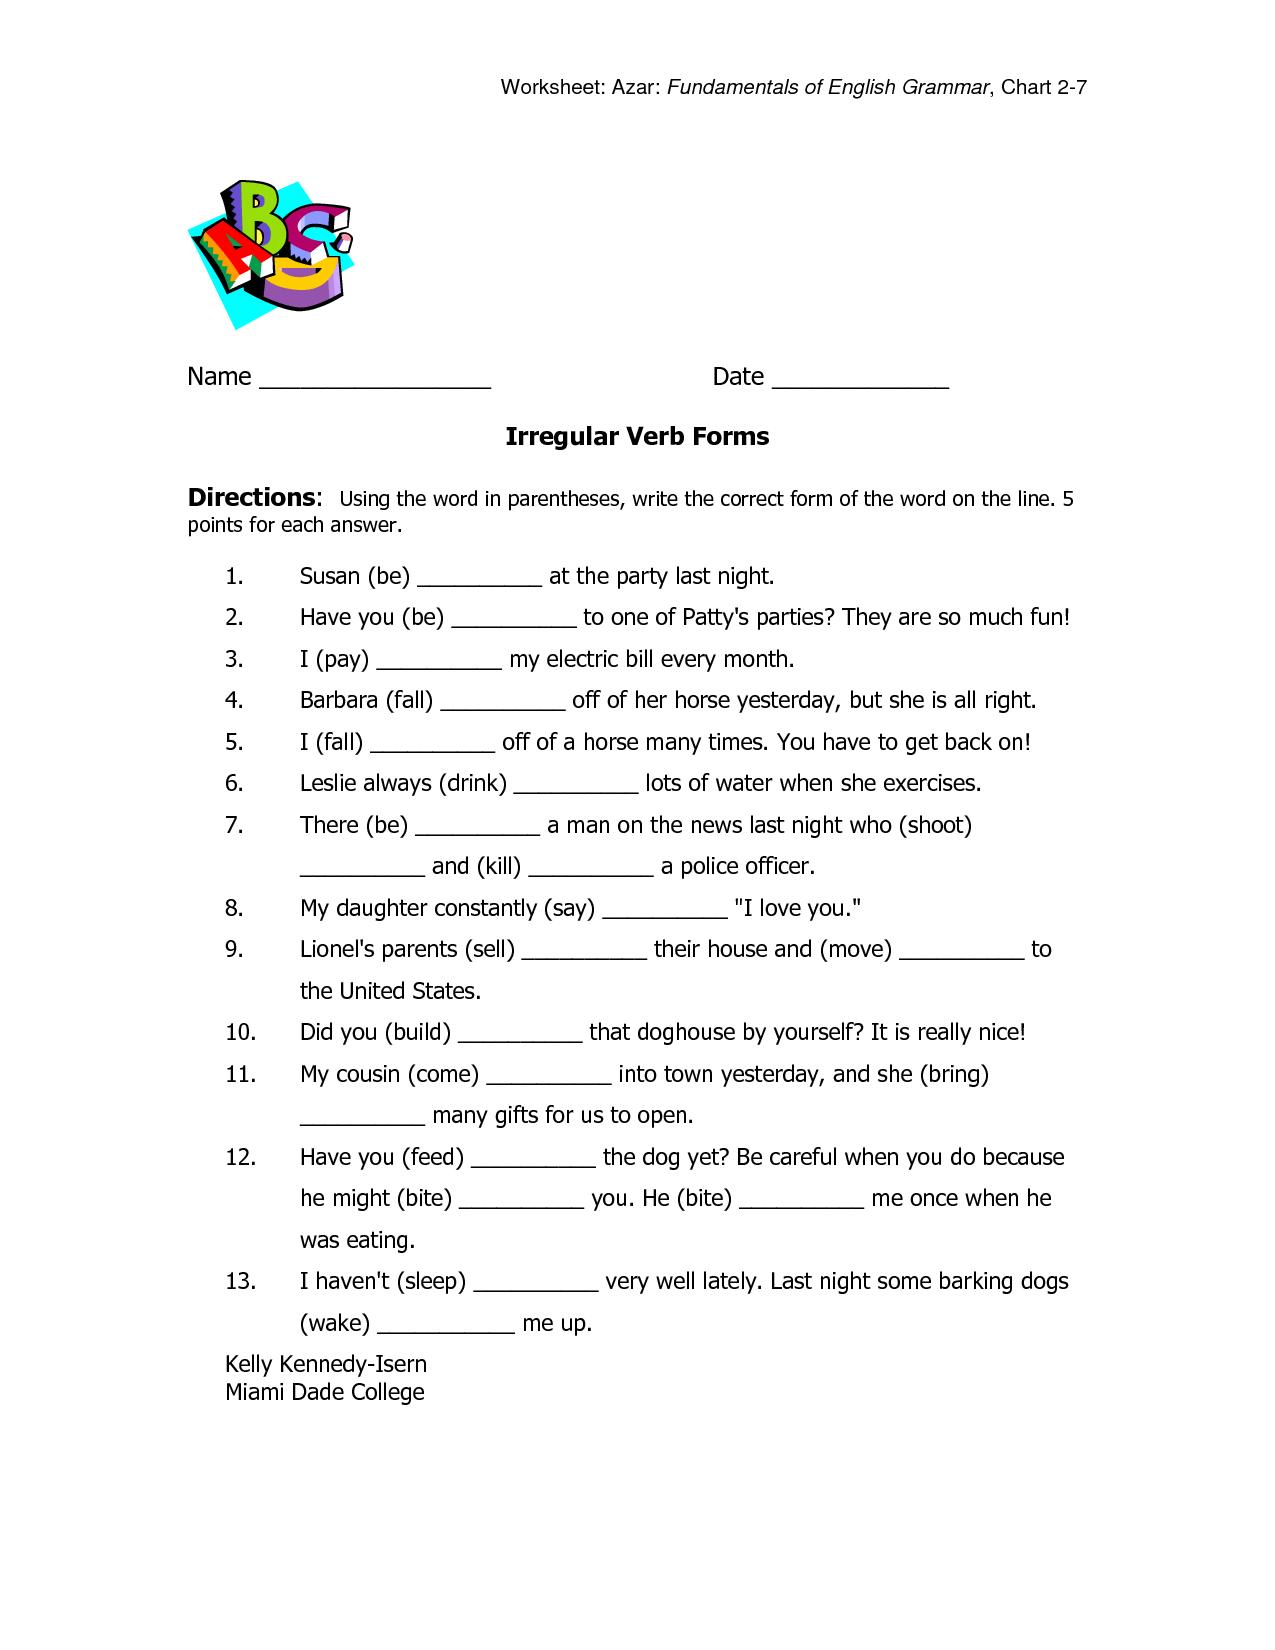 Irregular Past Tense Verbs Worksheet Ks2